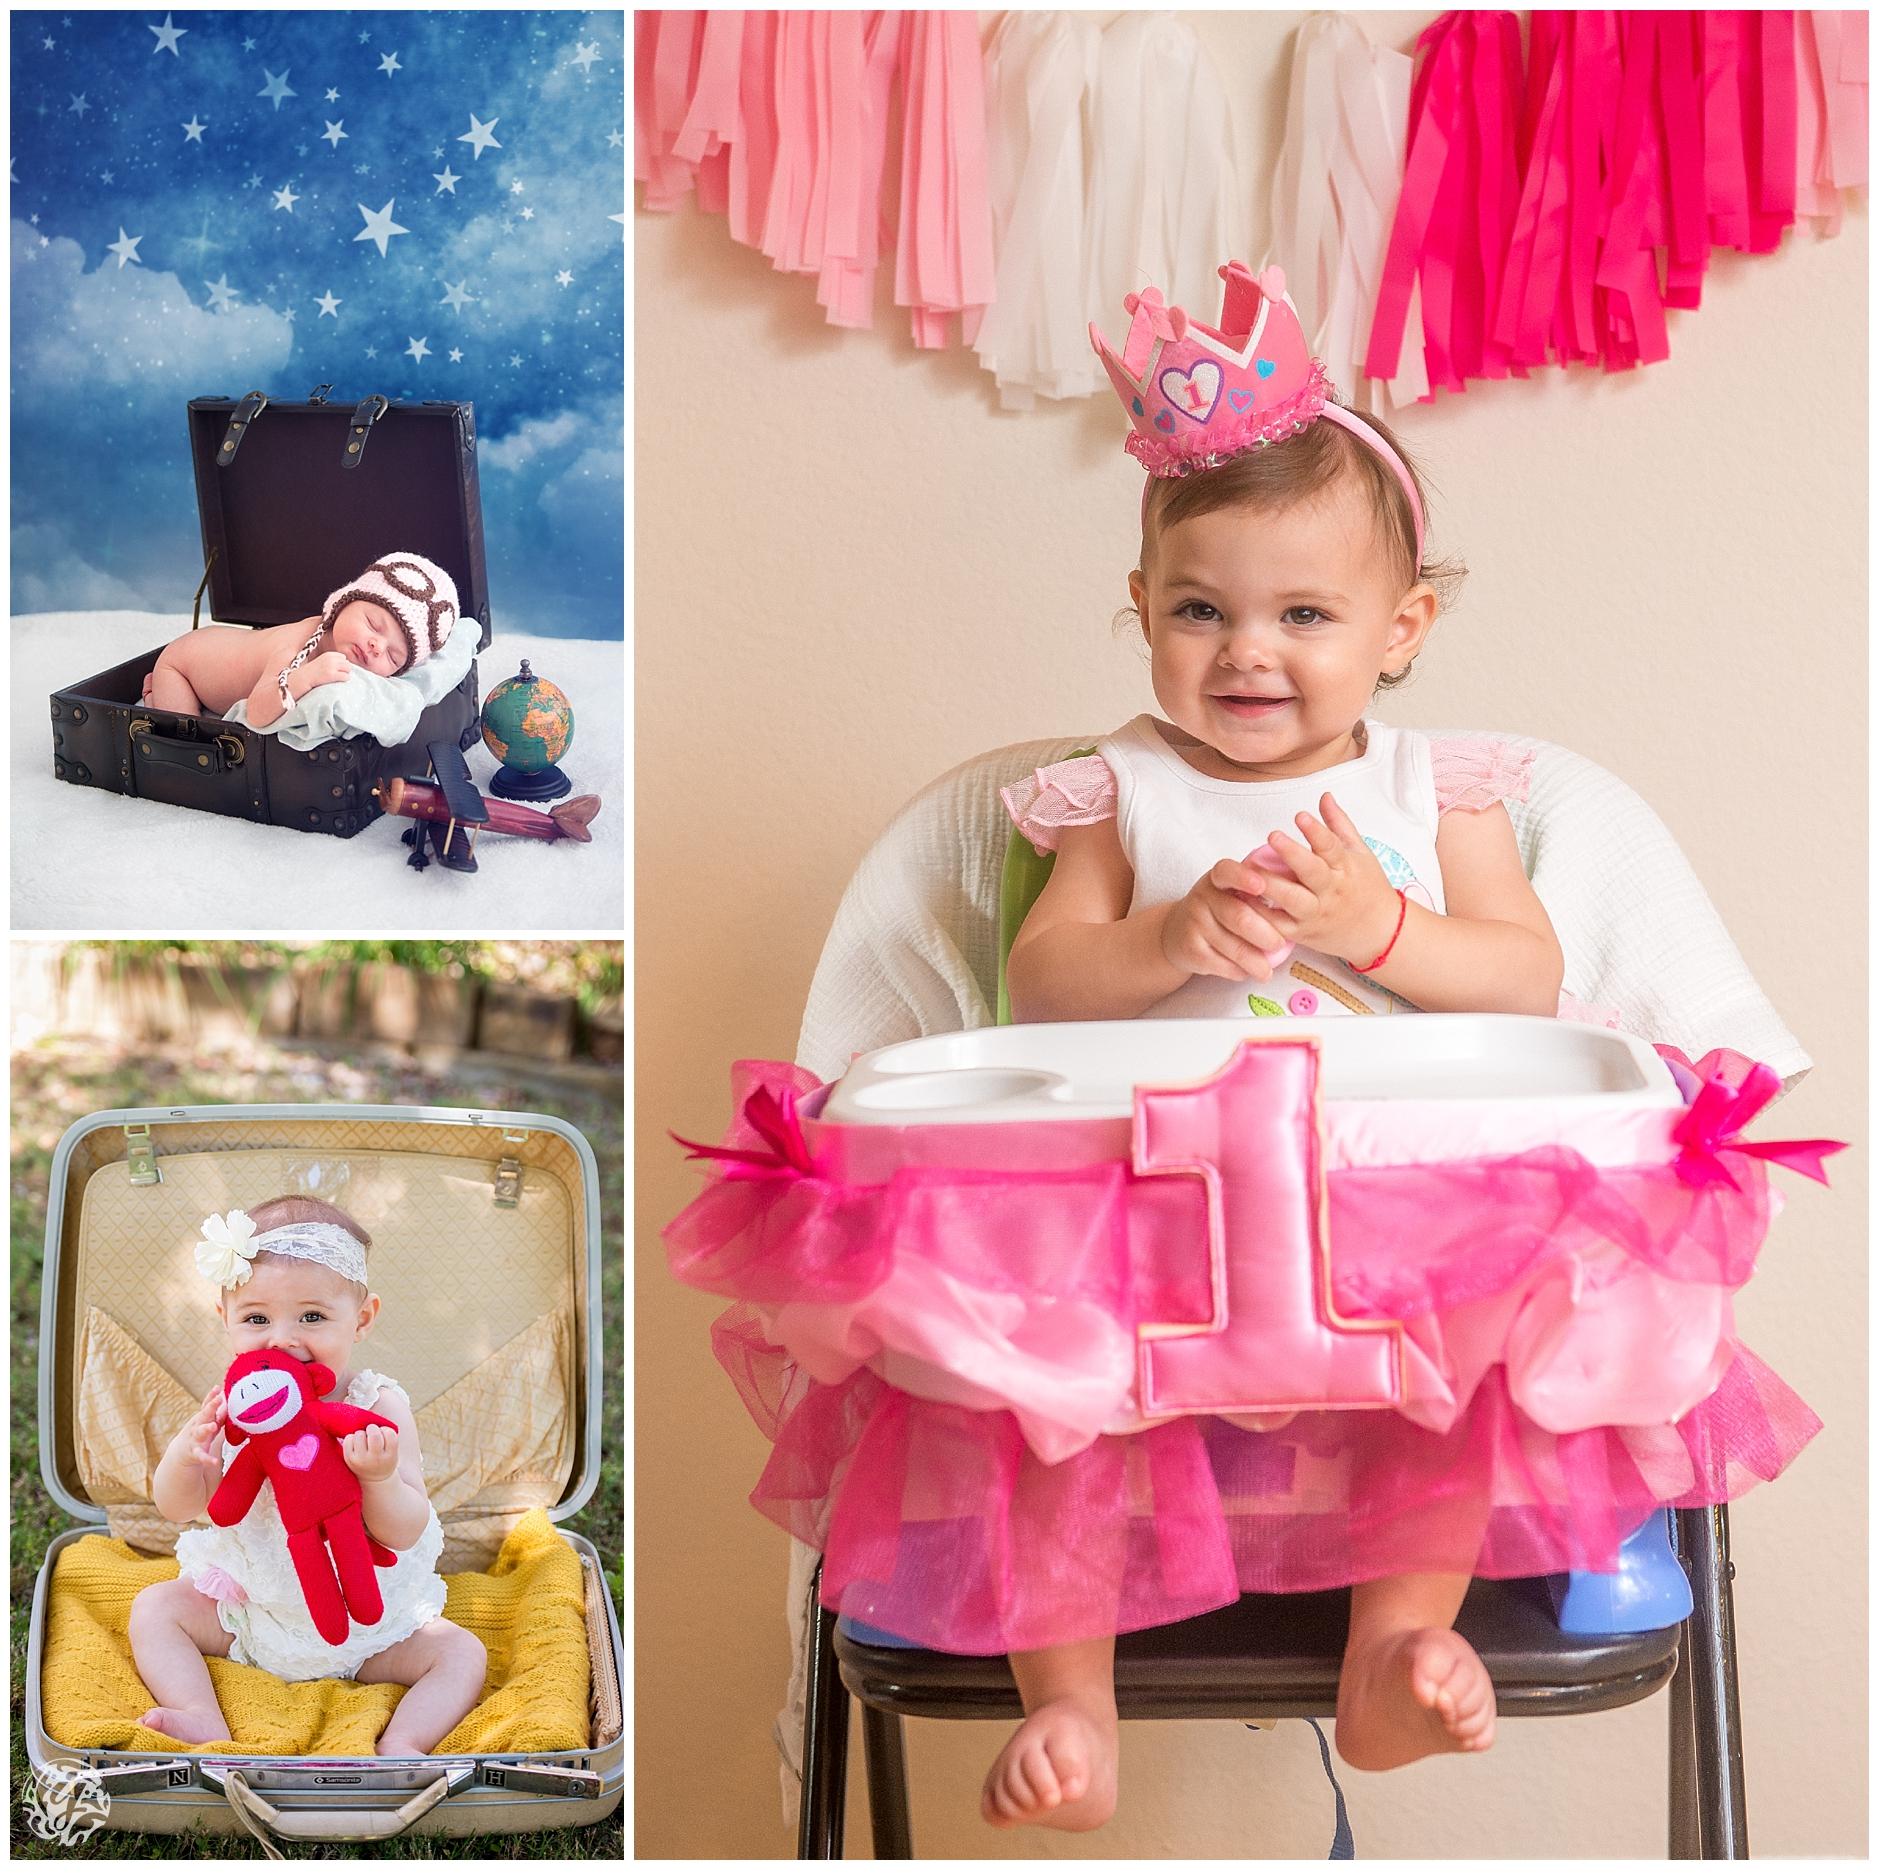 15-Ava-Newborn Photos-7 months - cake smash-18-Edit-1.jpg